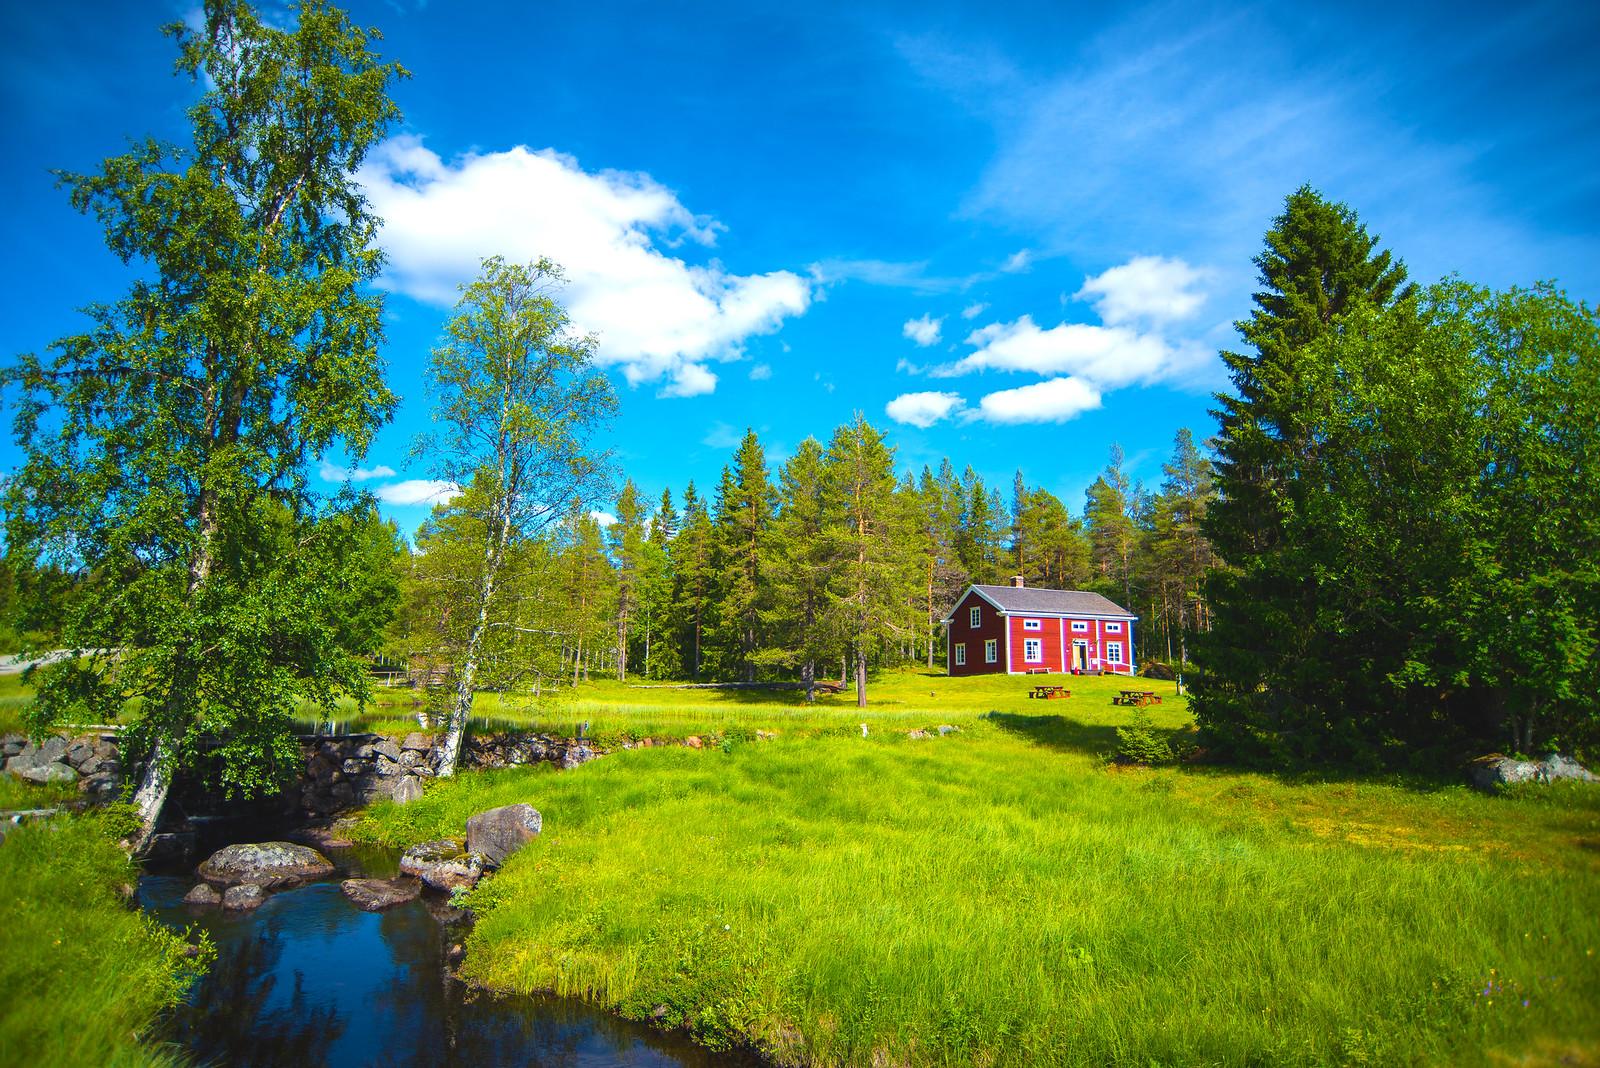 Swedish historical landscape